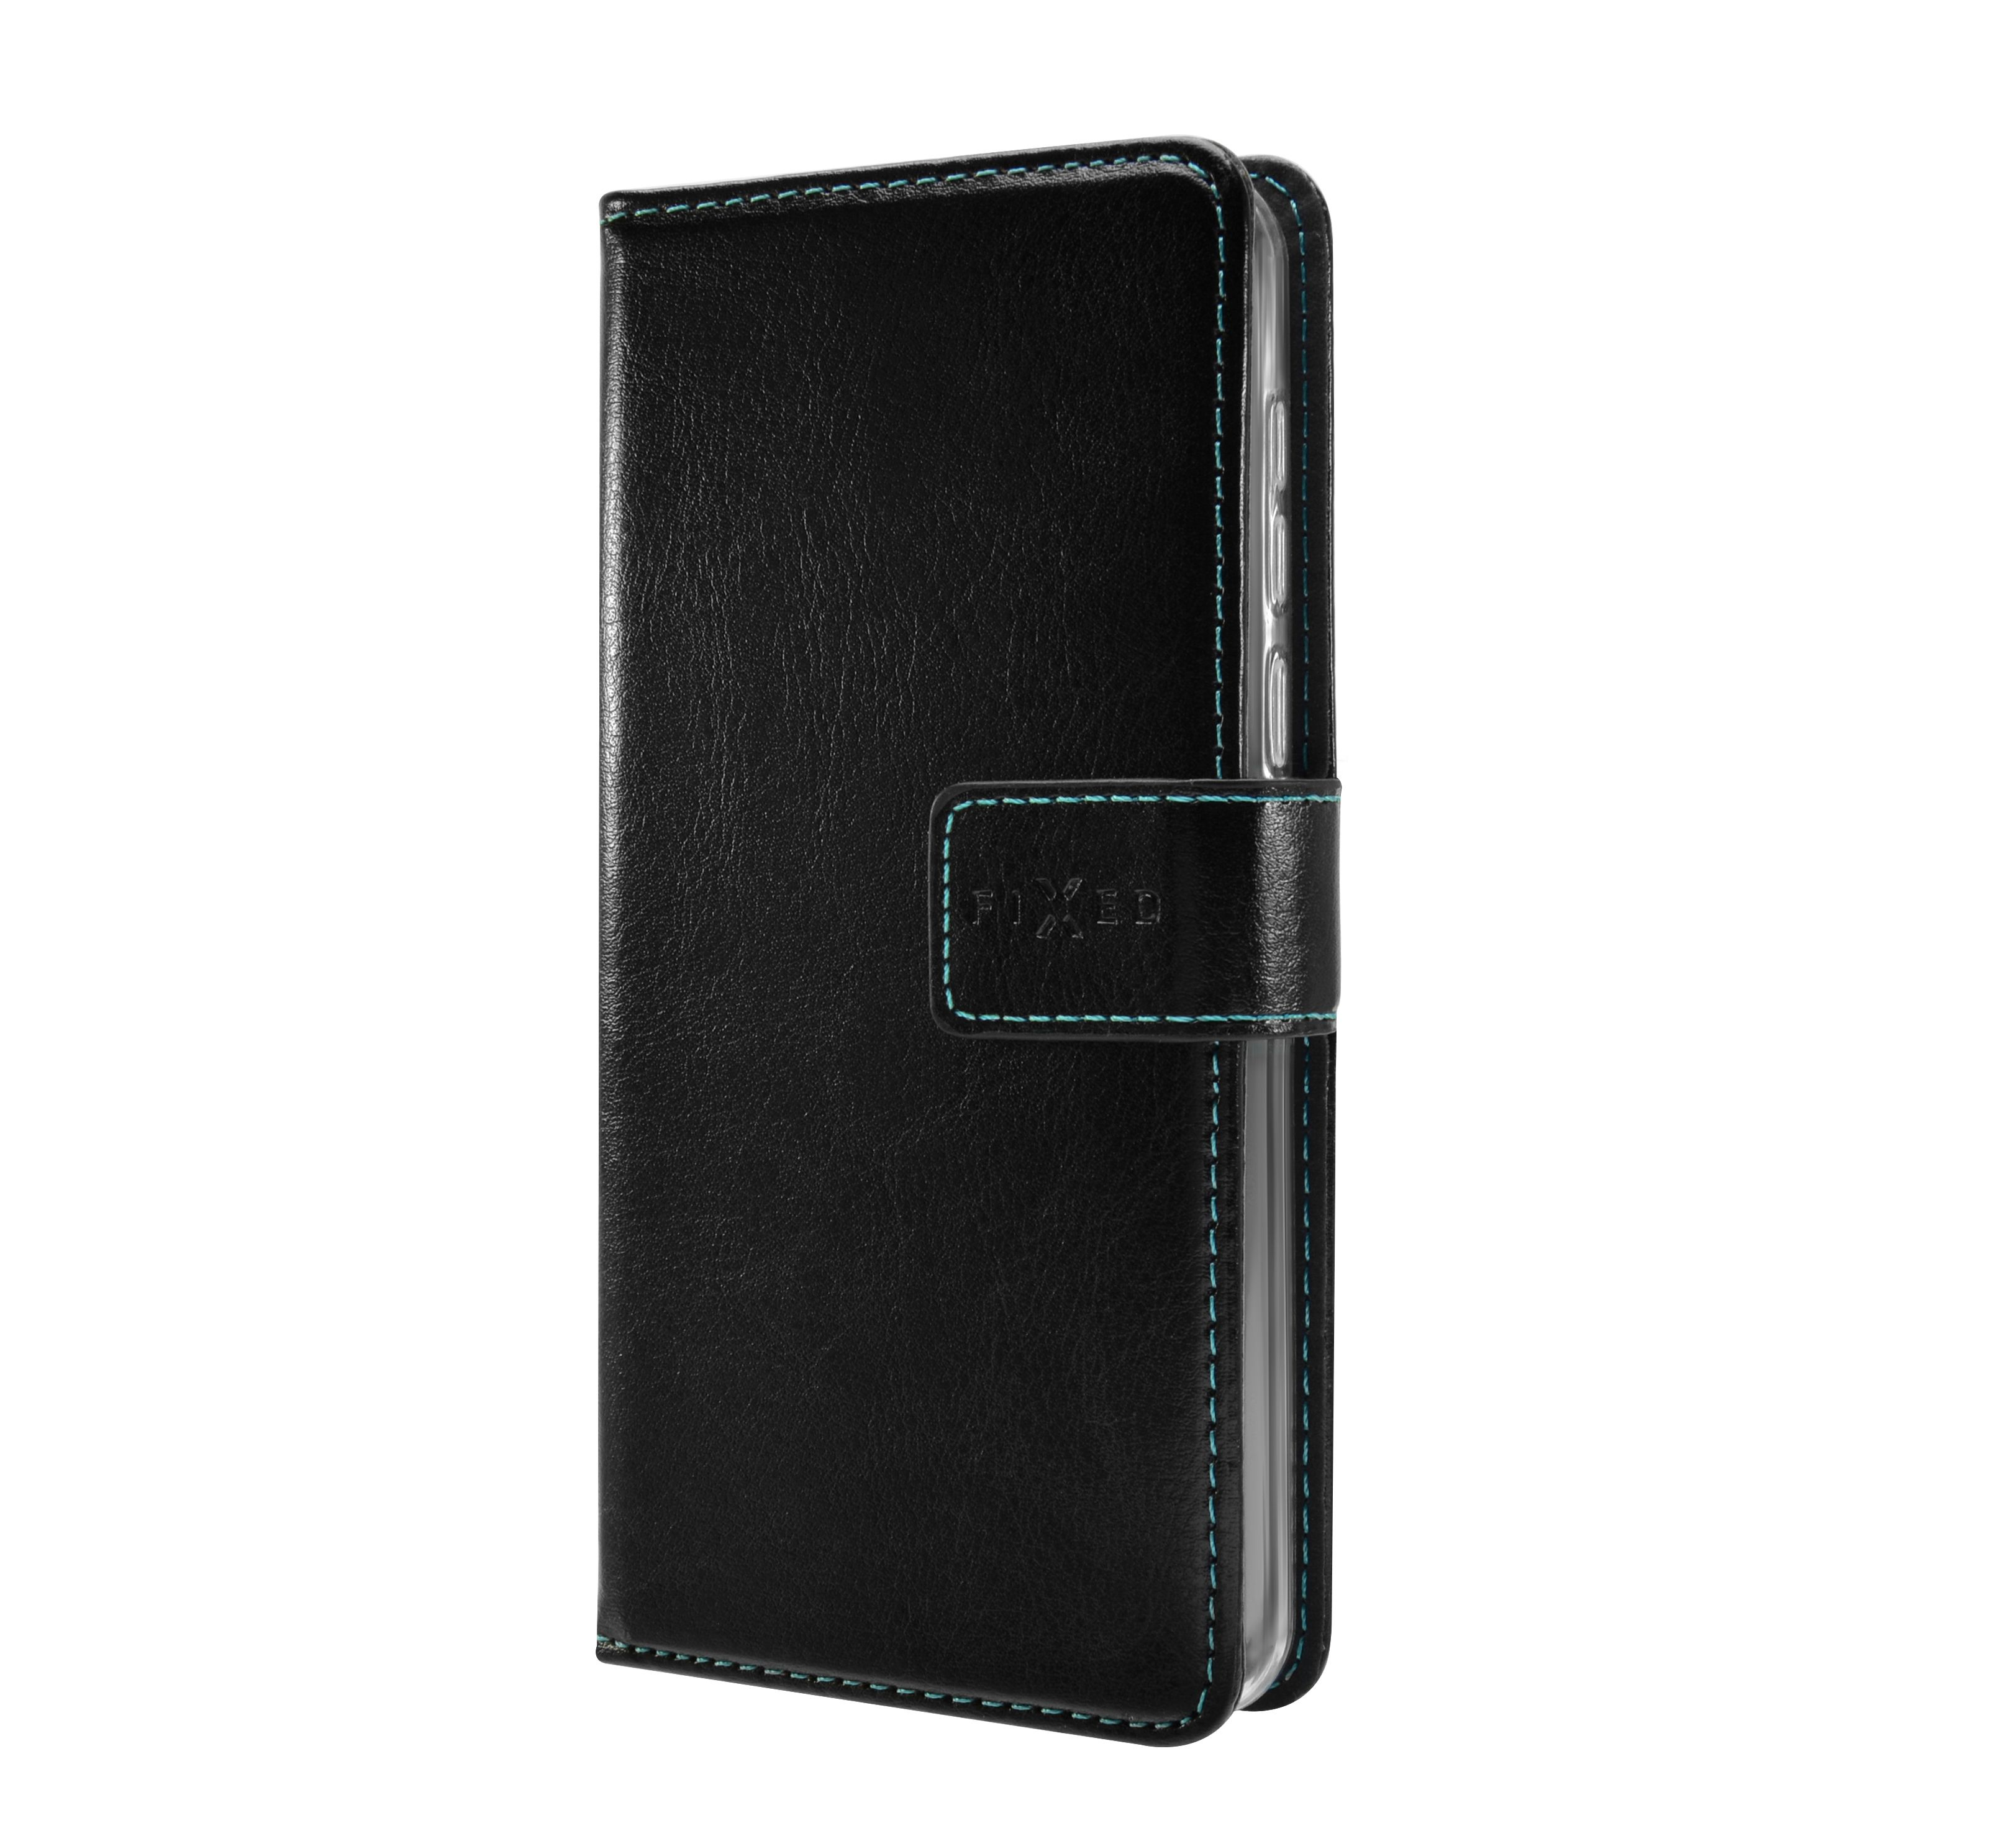 Pouzdro typu kniha FIXED Opus pro Samsung Galaxy A9 (2018), černé